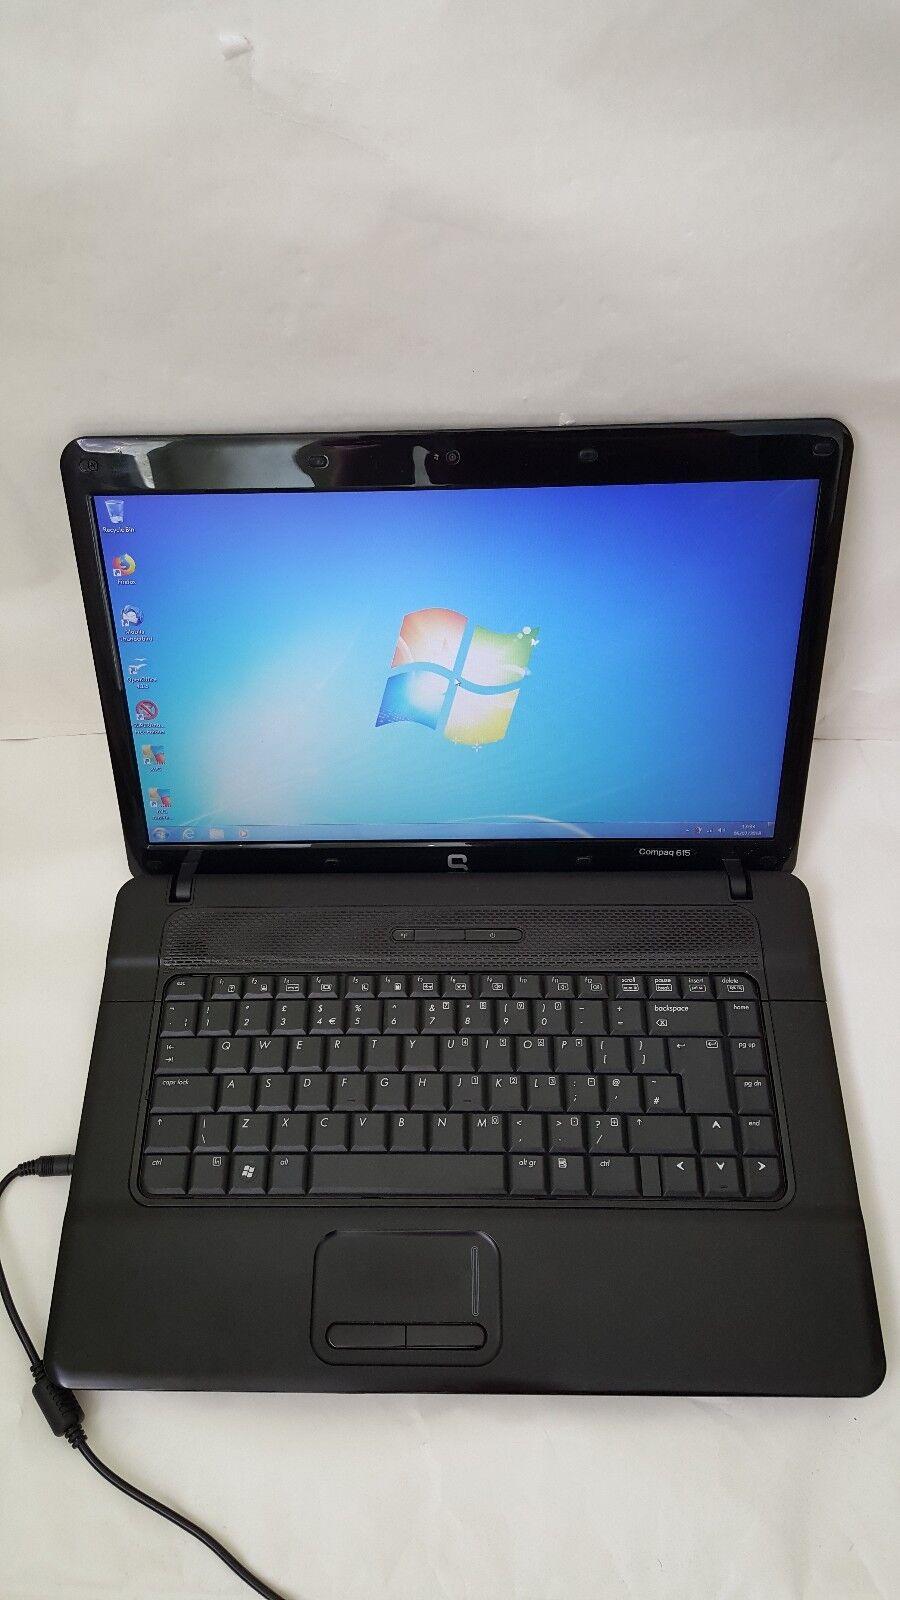 "Compaq 615 Notebook Laptop 15.6"" 1GB 320GB Webcam Windows 7 Open Office ATI HD"